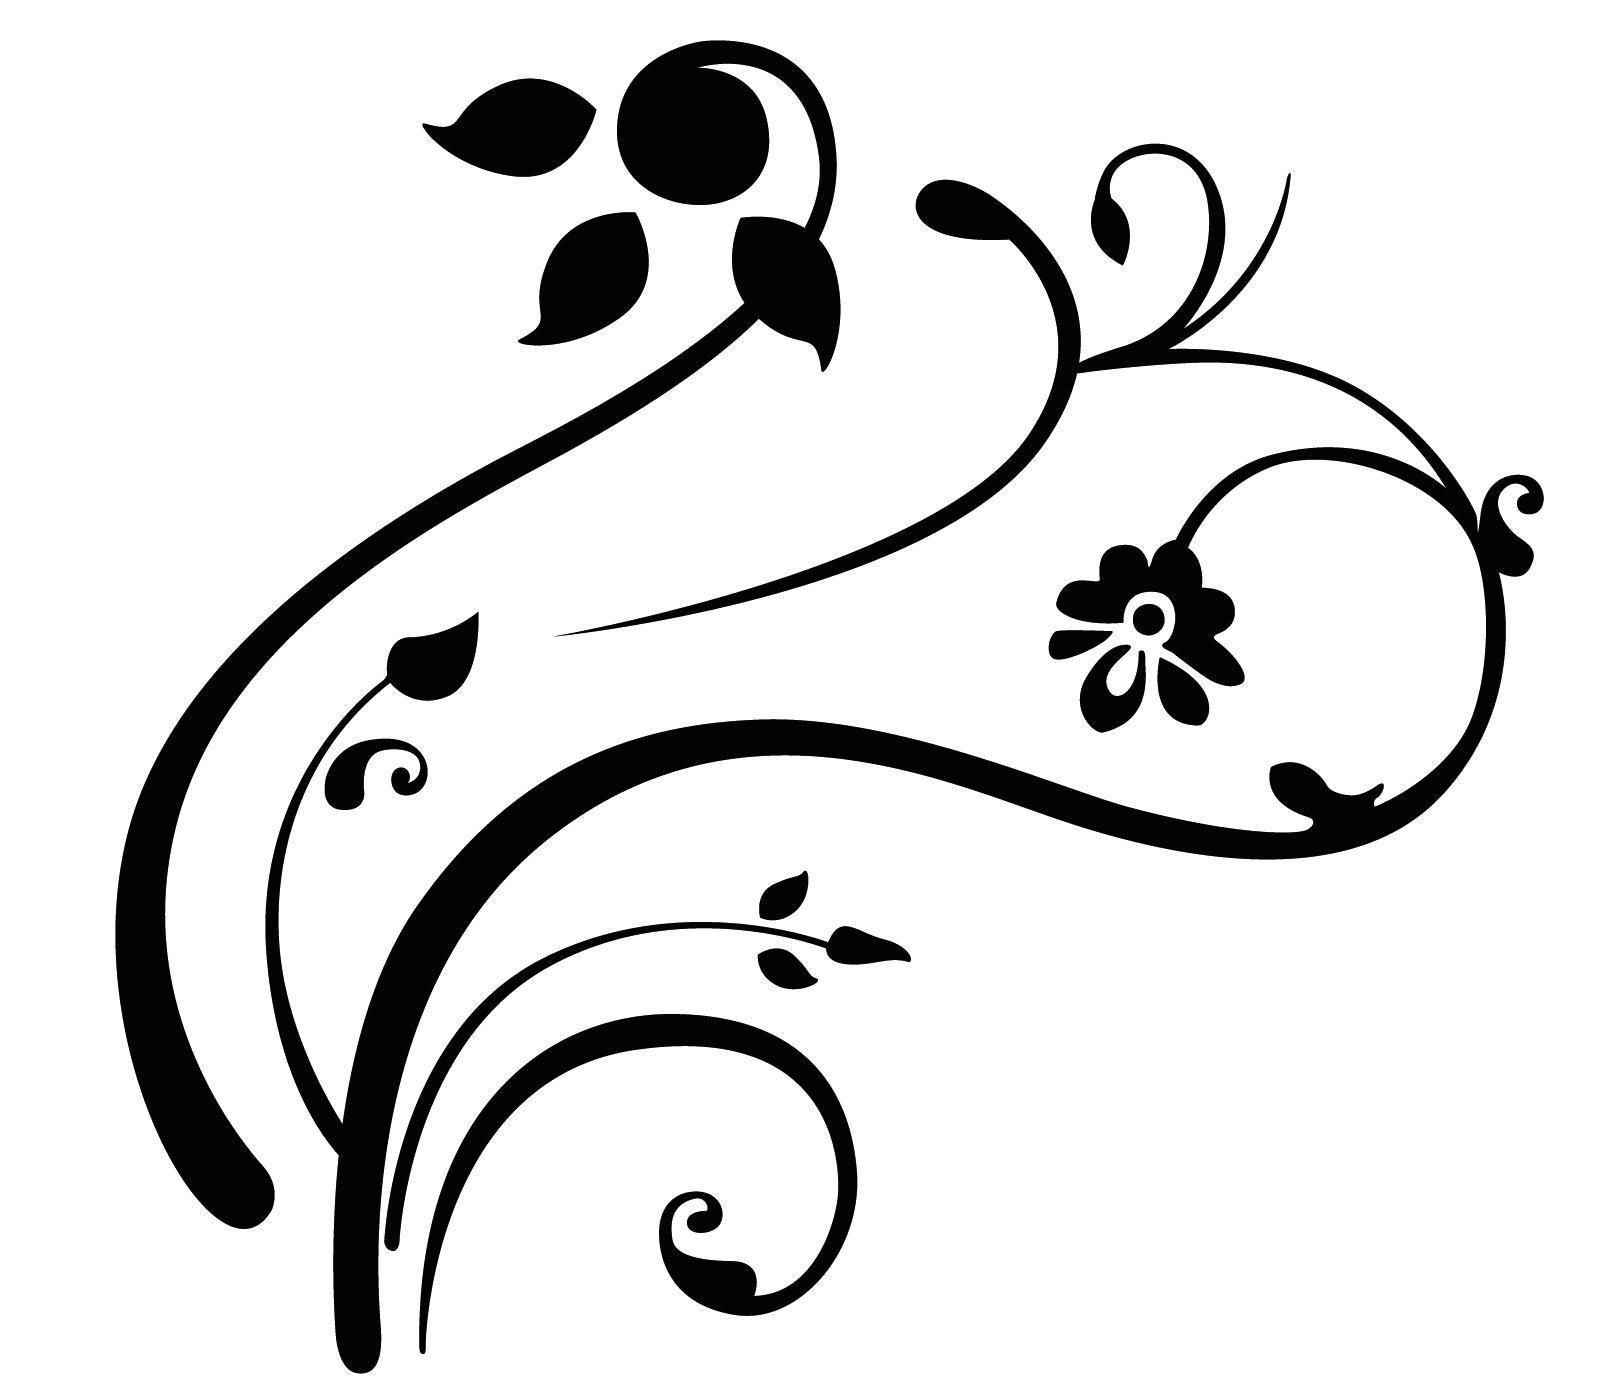 Simple Line Art Designs